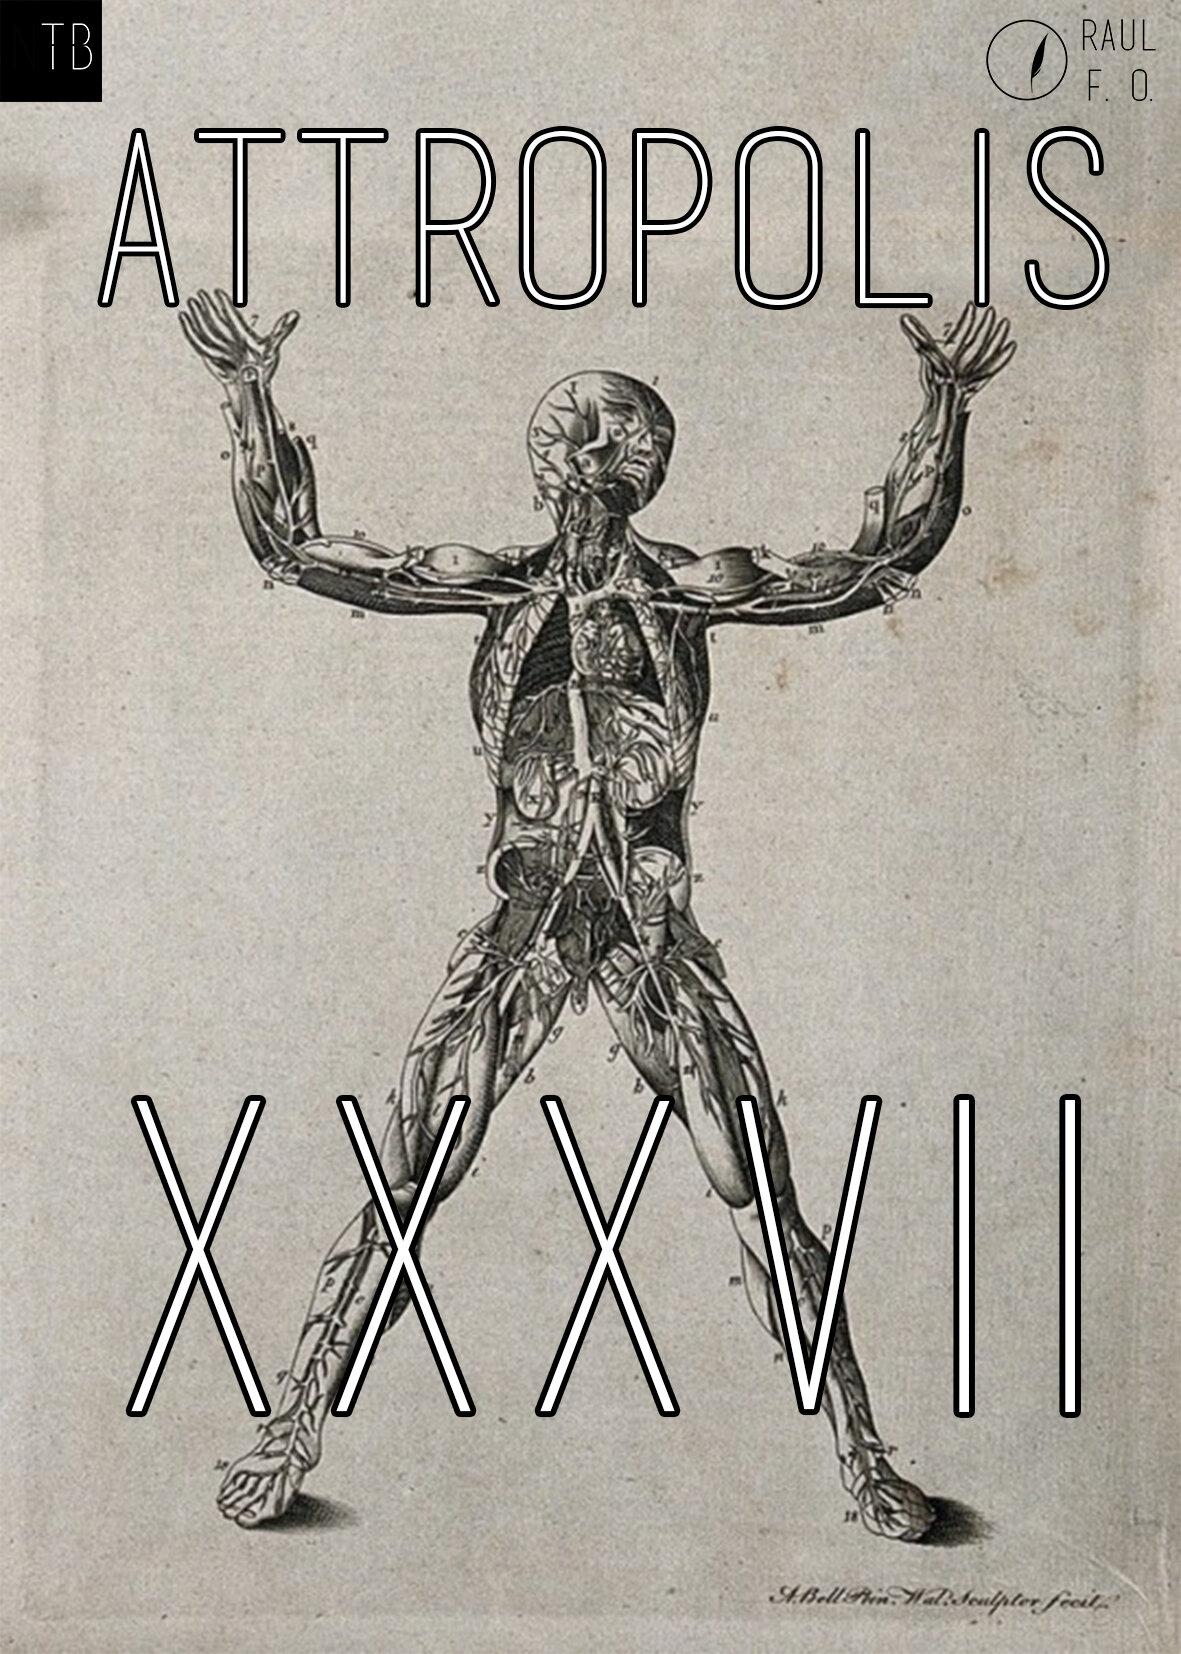 attropolis37.jpg